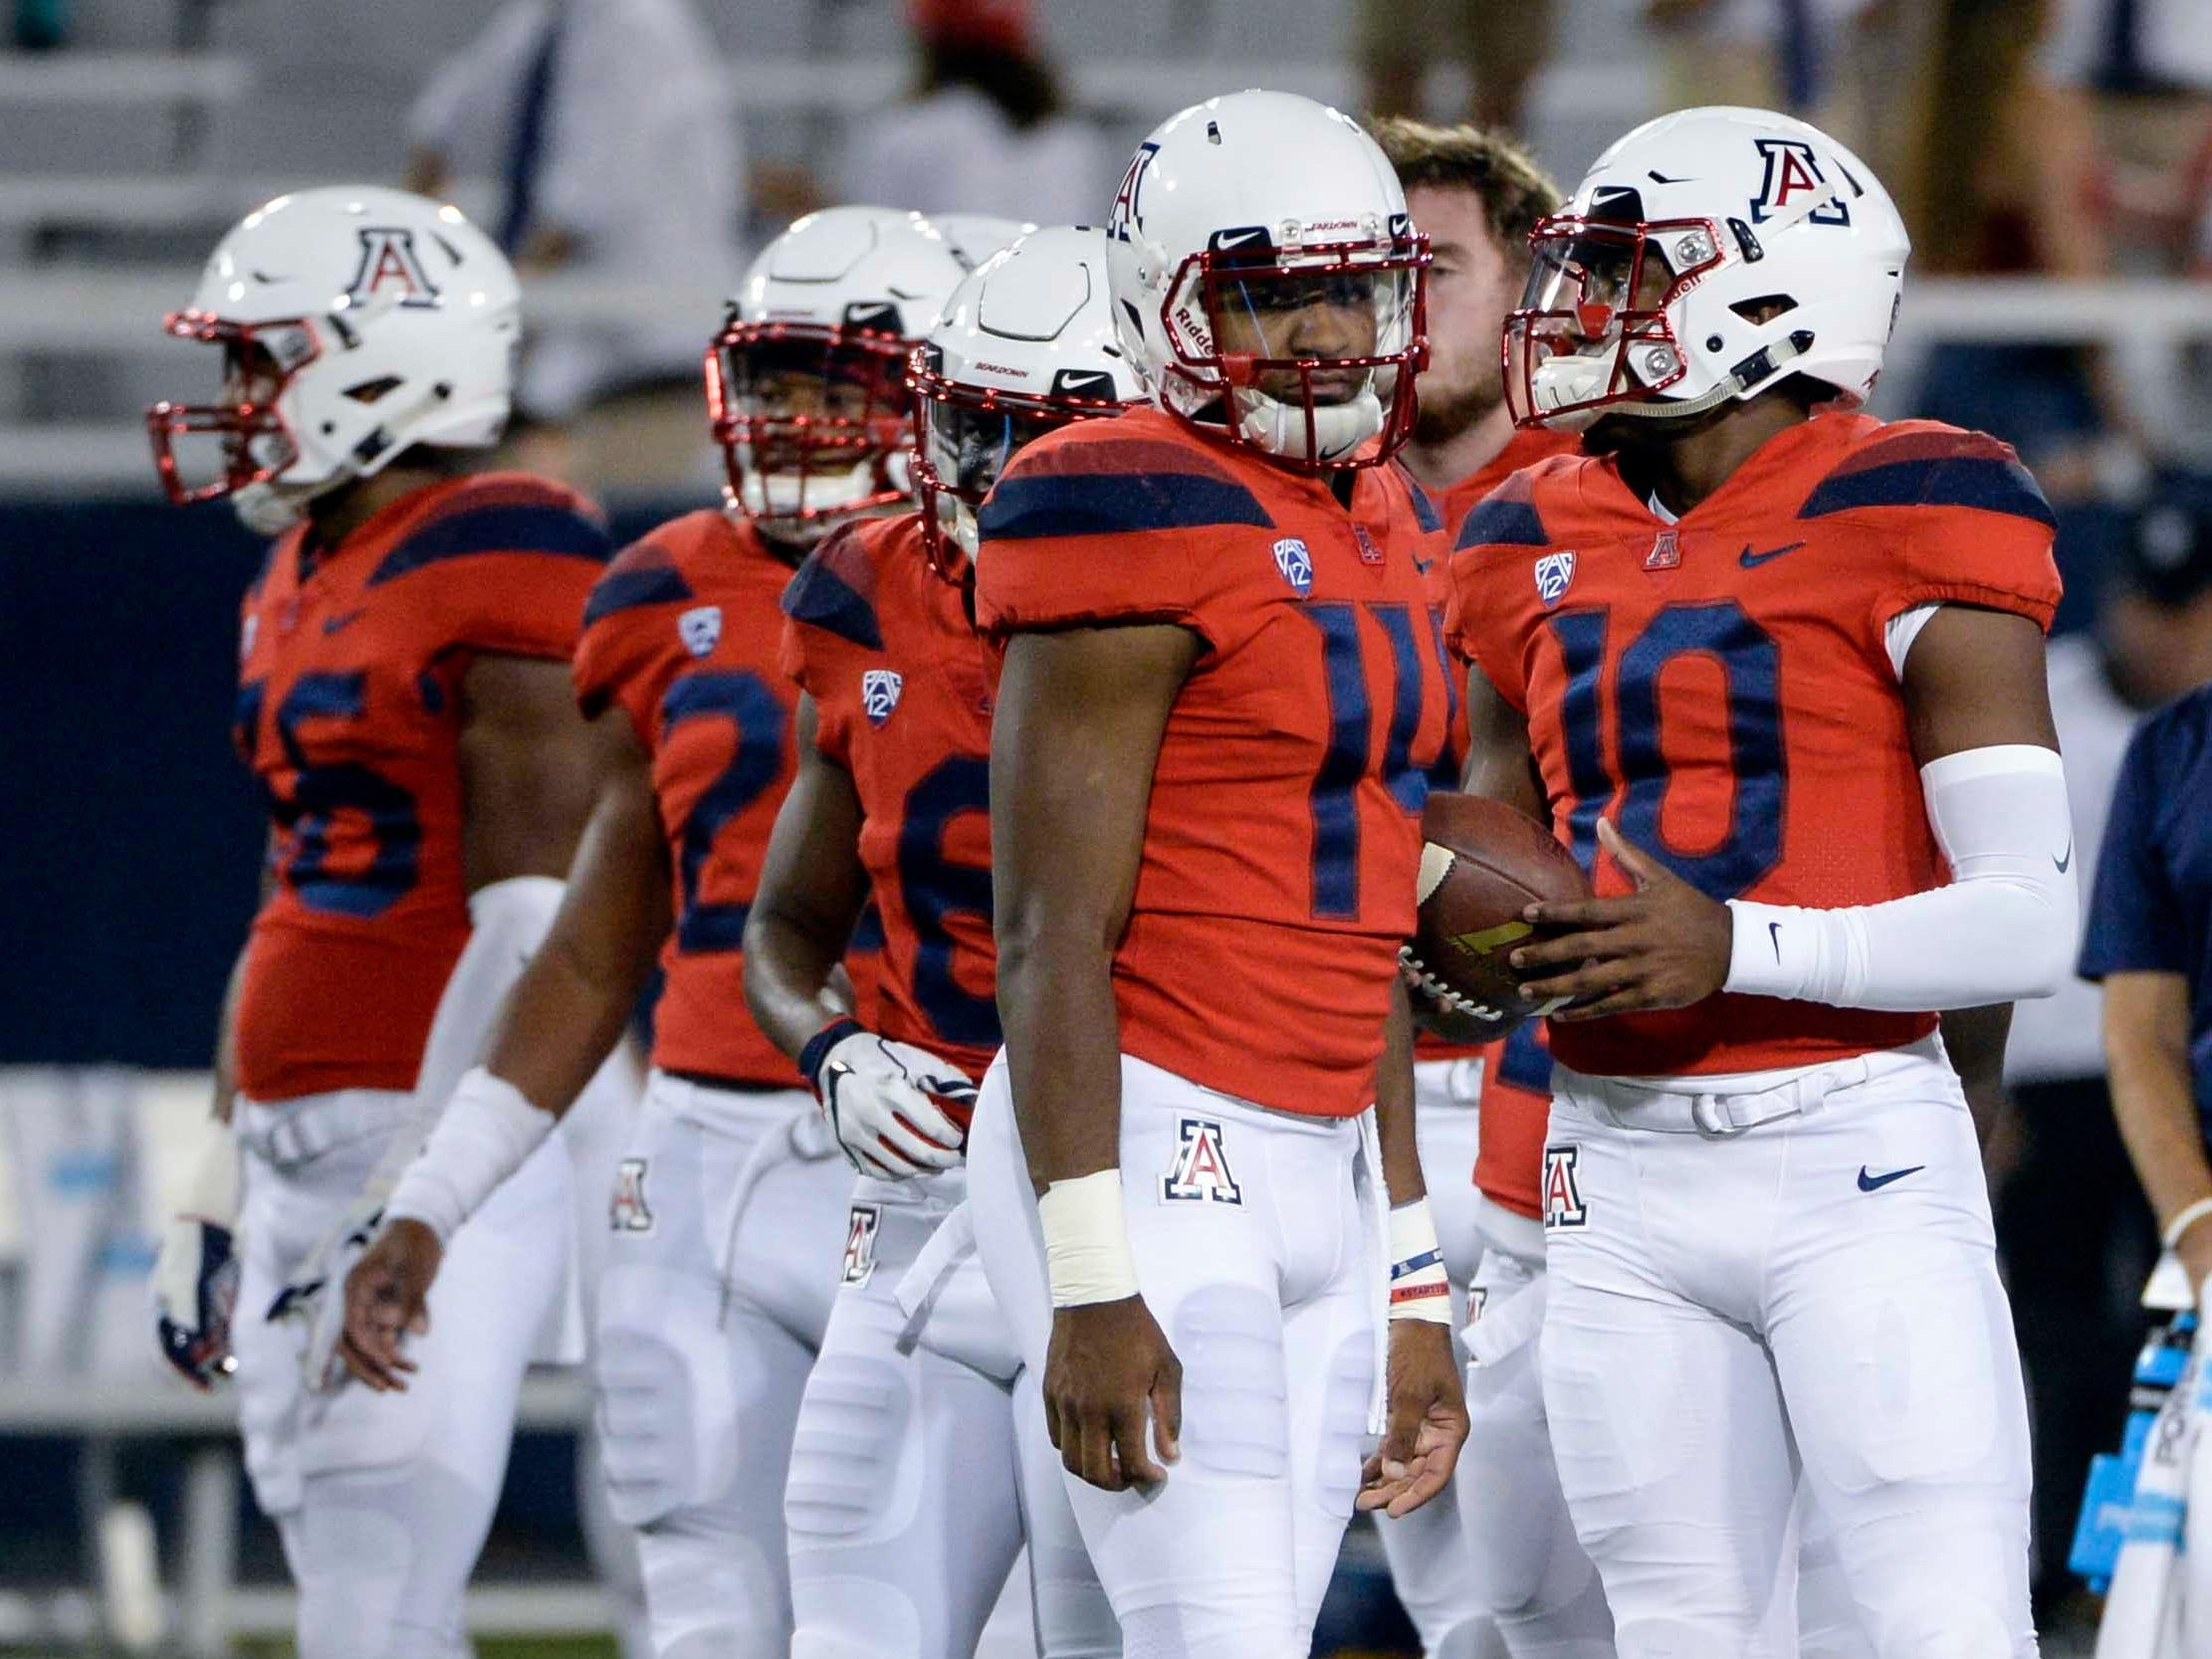 Oct 6, 2018; Tucson, AZ, USA; Arizona Wildcats quarterback Khalil Tate (14) and quarterback Jamarye Joiner (10) (right) warm up before playing the California Golden Bears at Arizona Stadium. Mandatory Credit: Casey Sapio-USA TODAY Sports